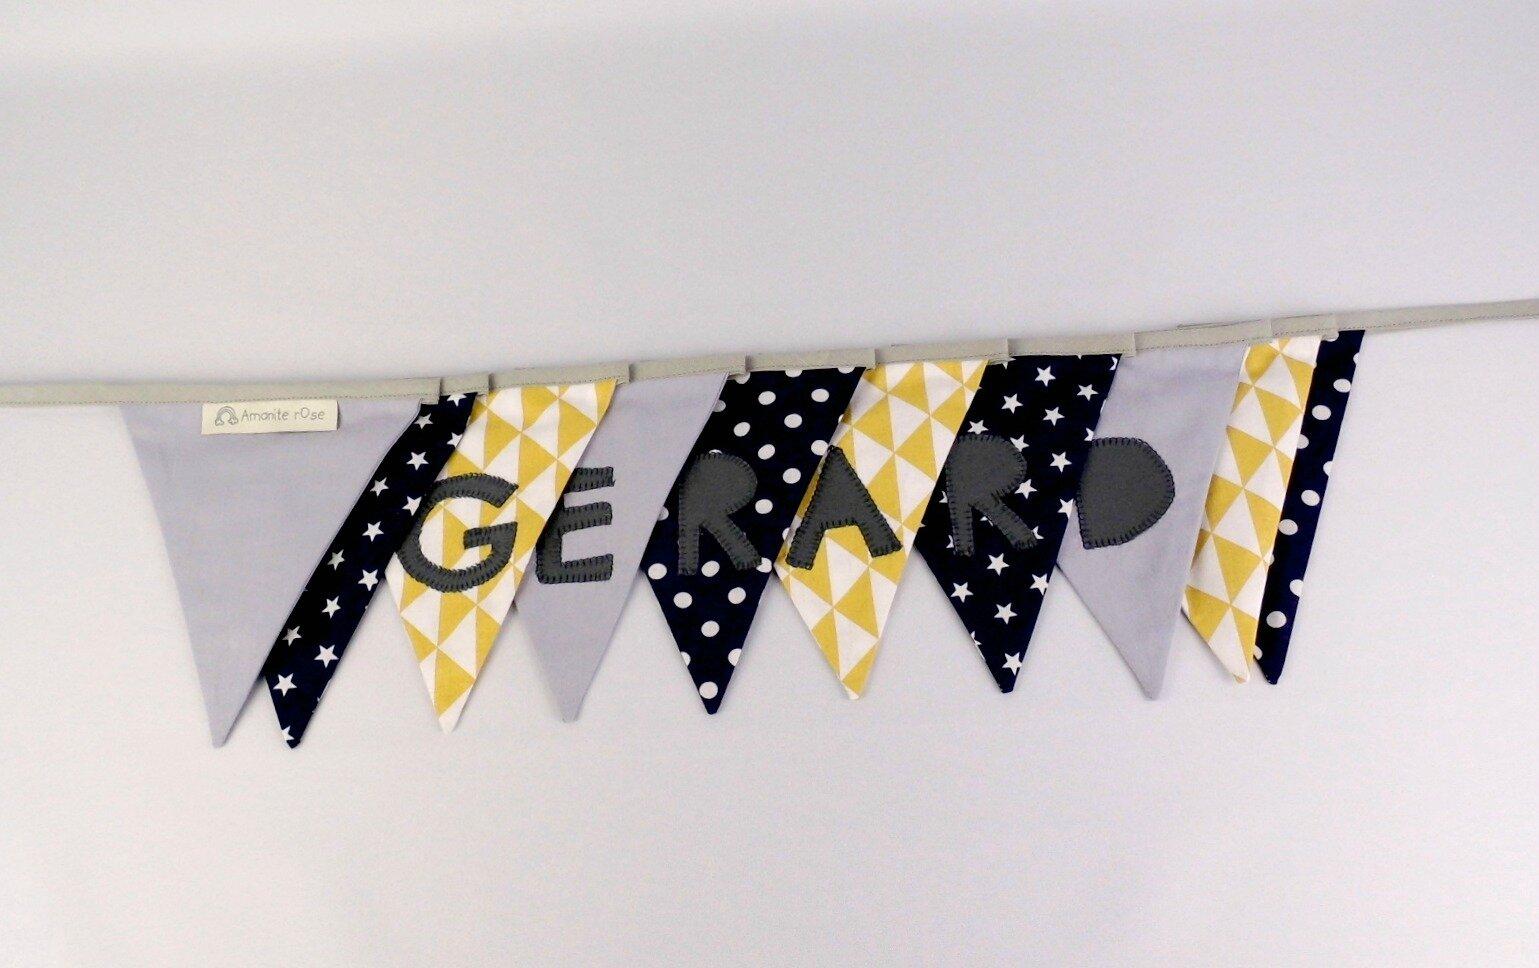 Nursery name banner personalized gift baby kids banderole fanions prénom Gerard gris bleu marine jaune moutarde